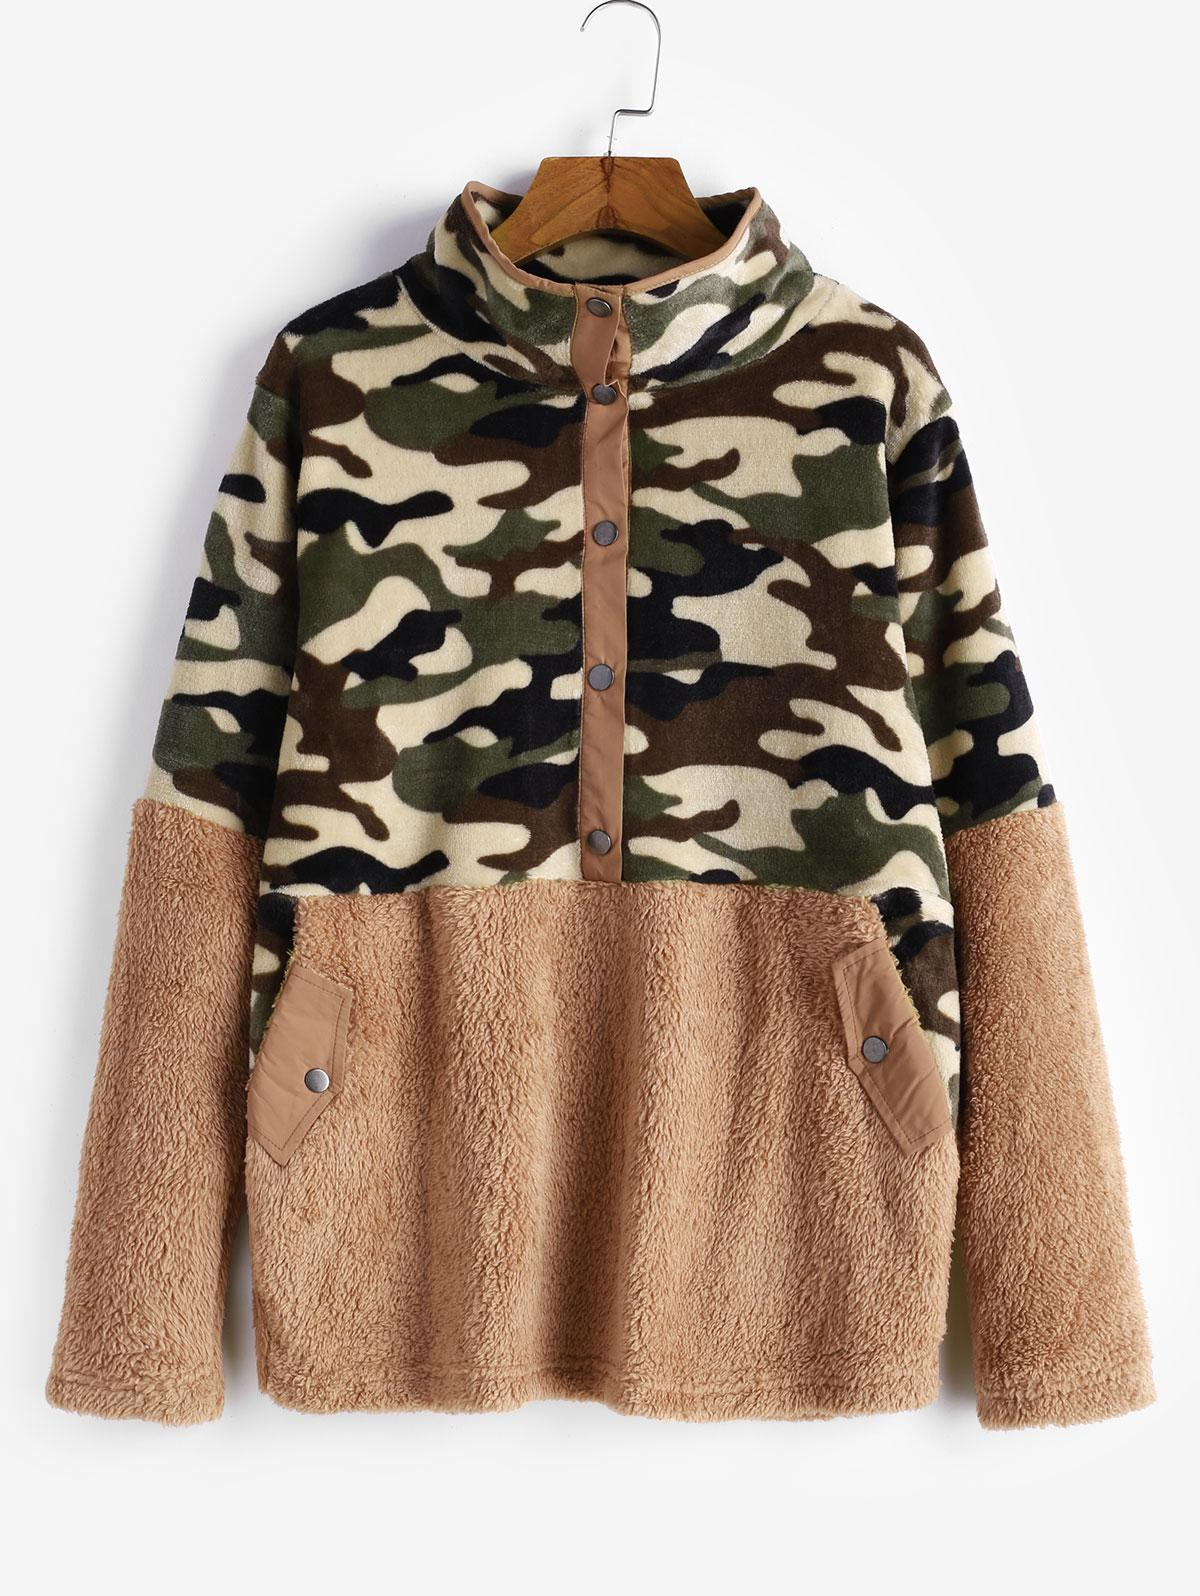 Snap Button Camouflage Pockets Fluffy Fleece Sweatshirt